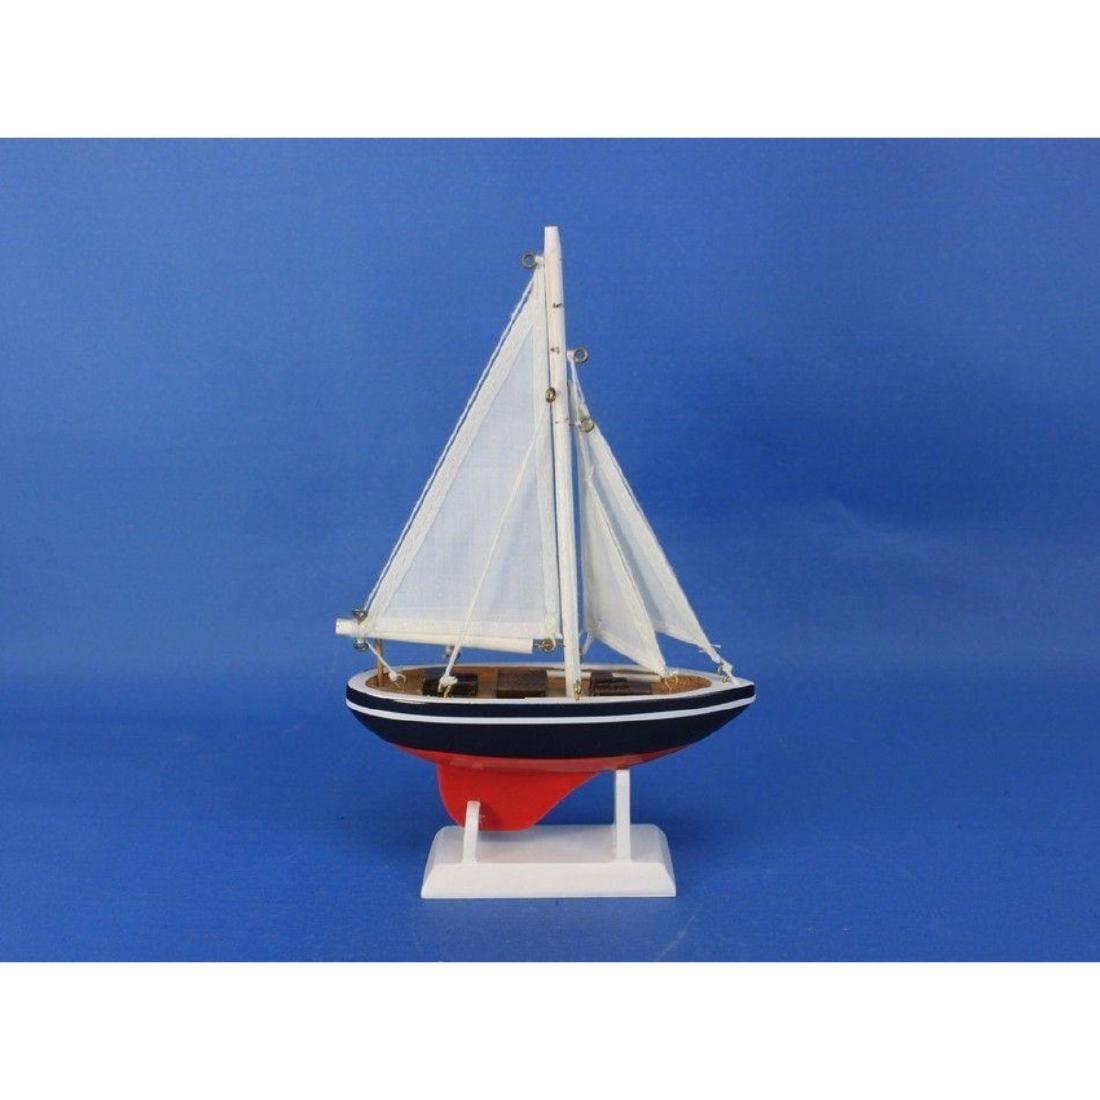 "Wooden American Sailer Model Sailboat Decoration 9"" - 6"